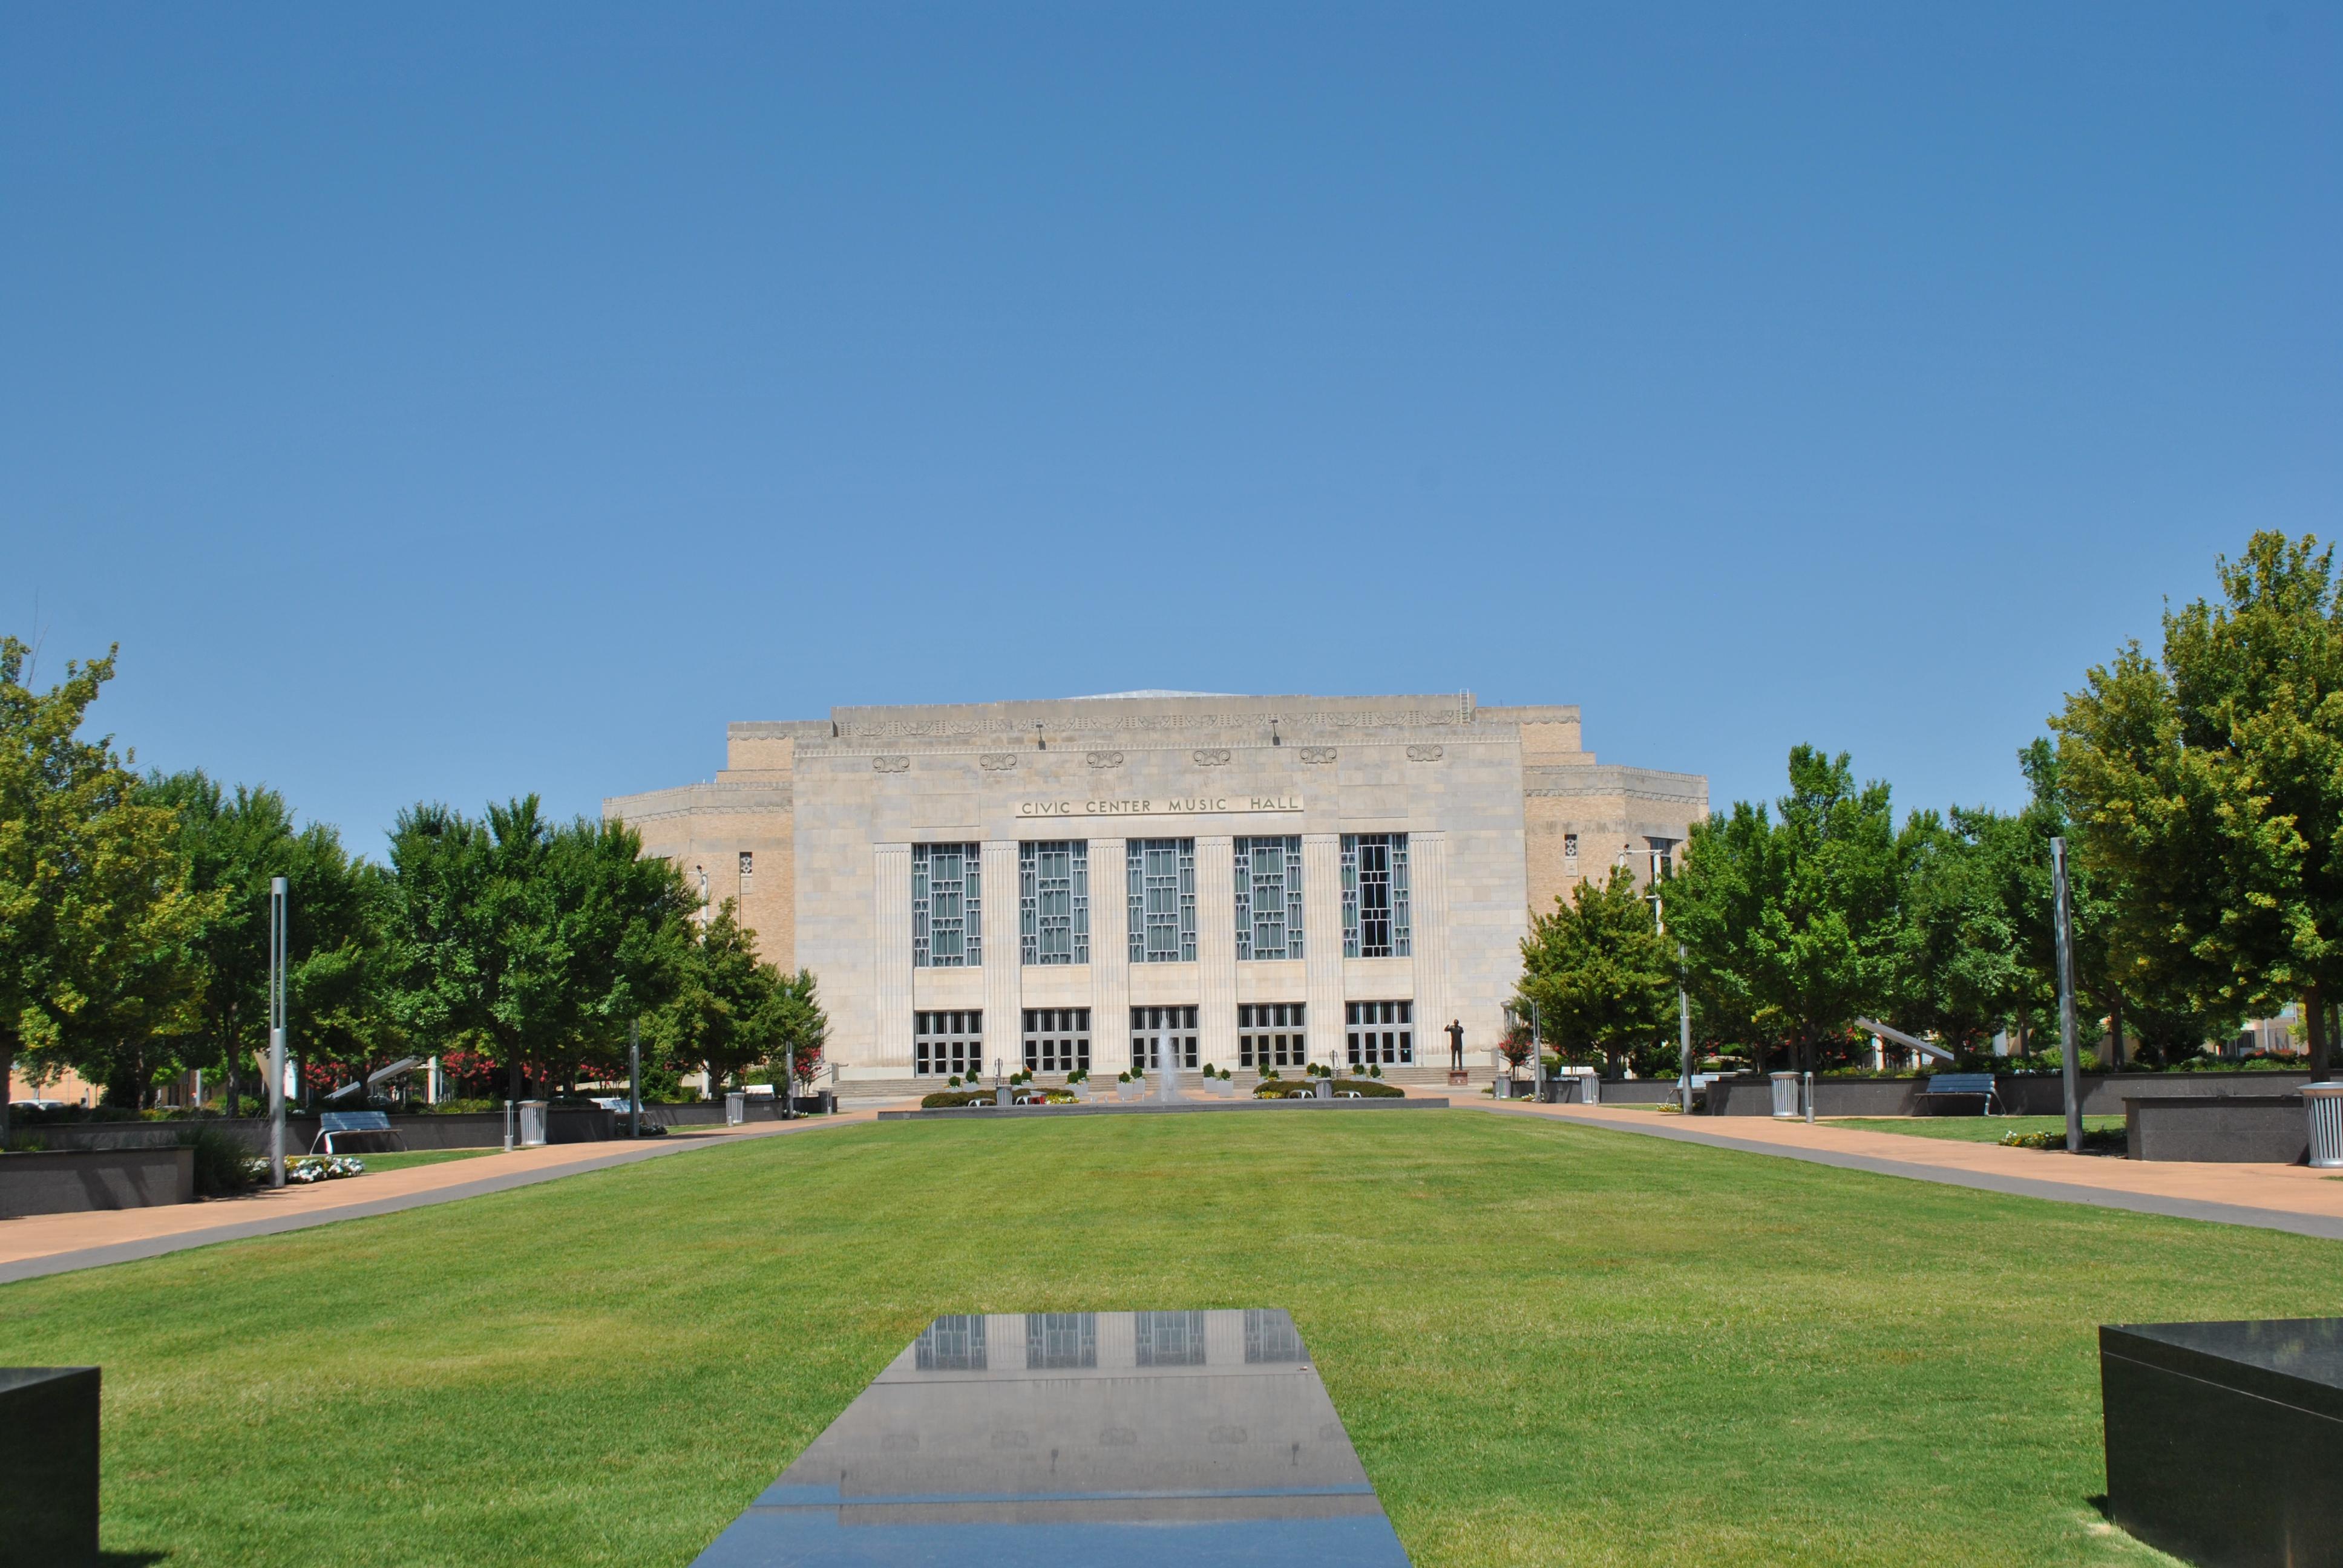 Oklahoma Civic Center